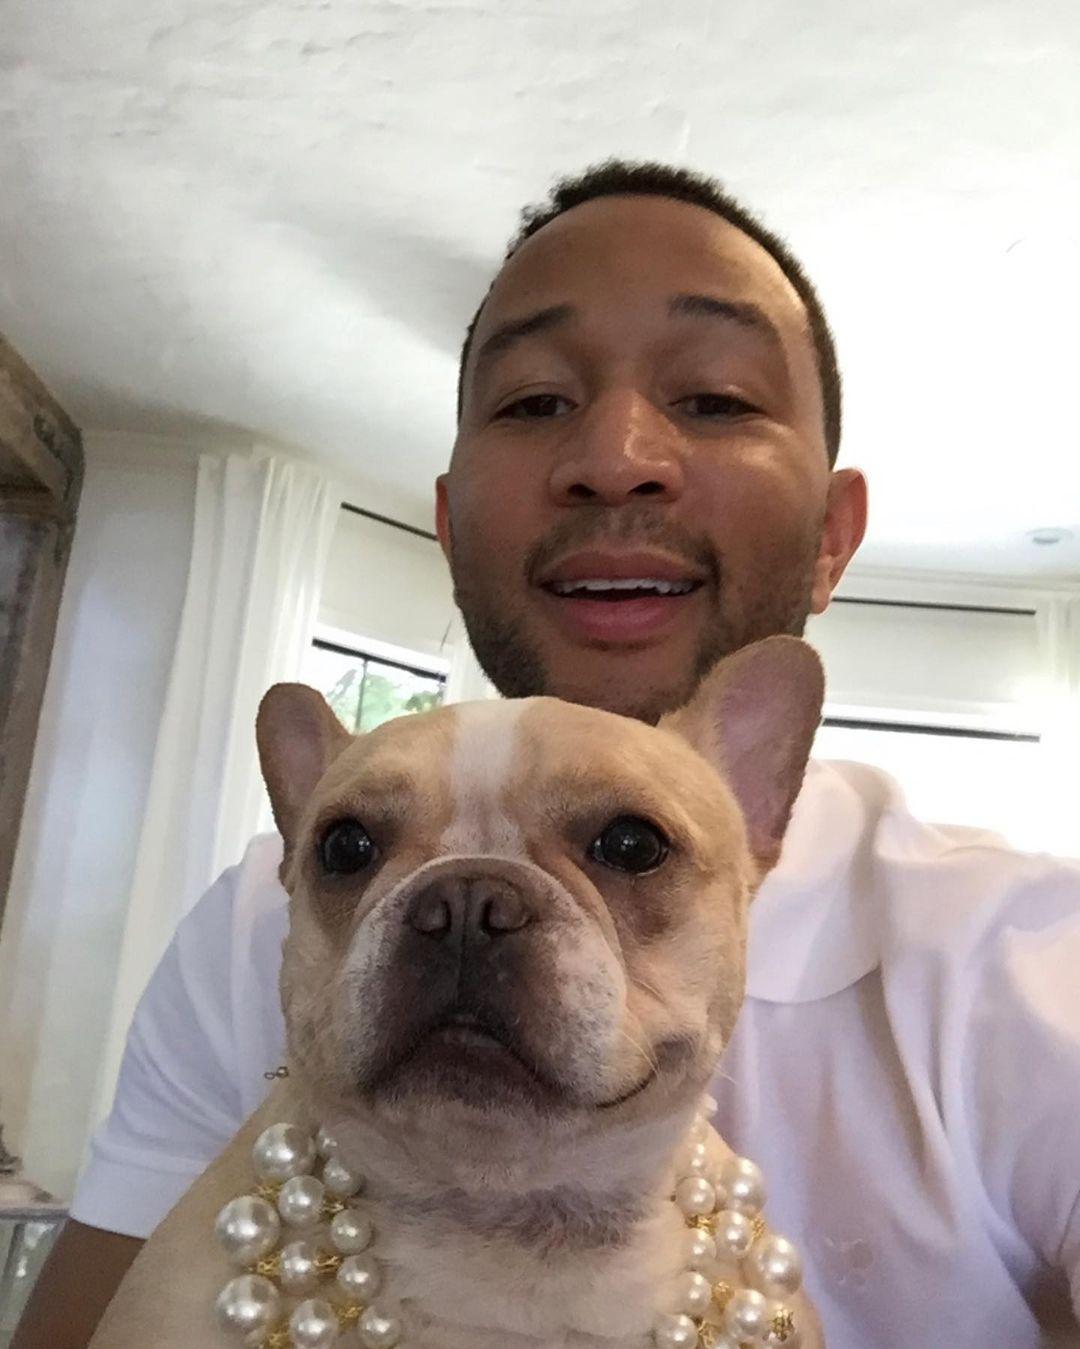 Chrissy Teigen And John Legend's Bulldog Passes Away